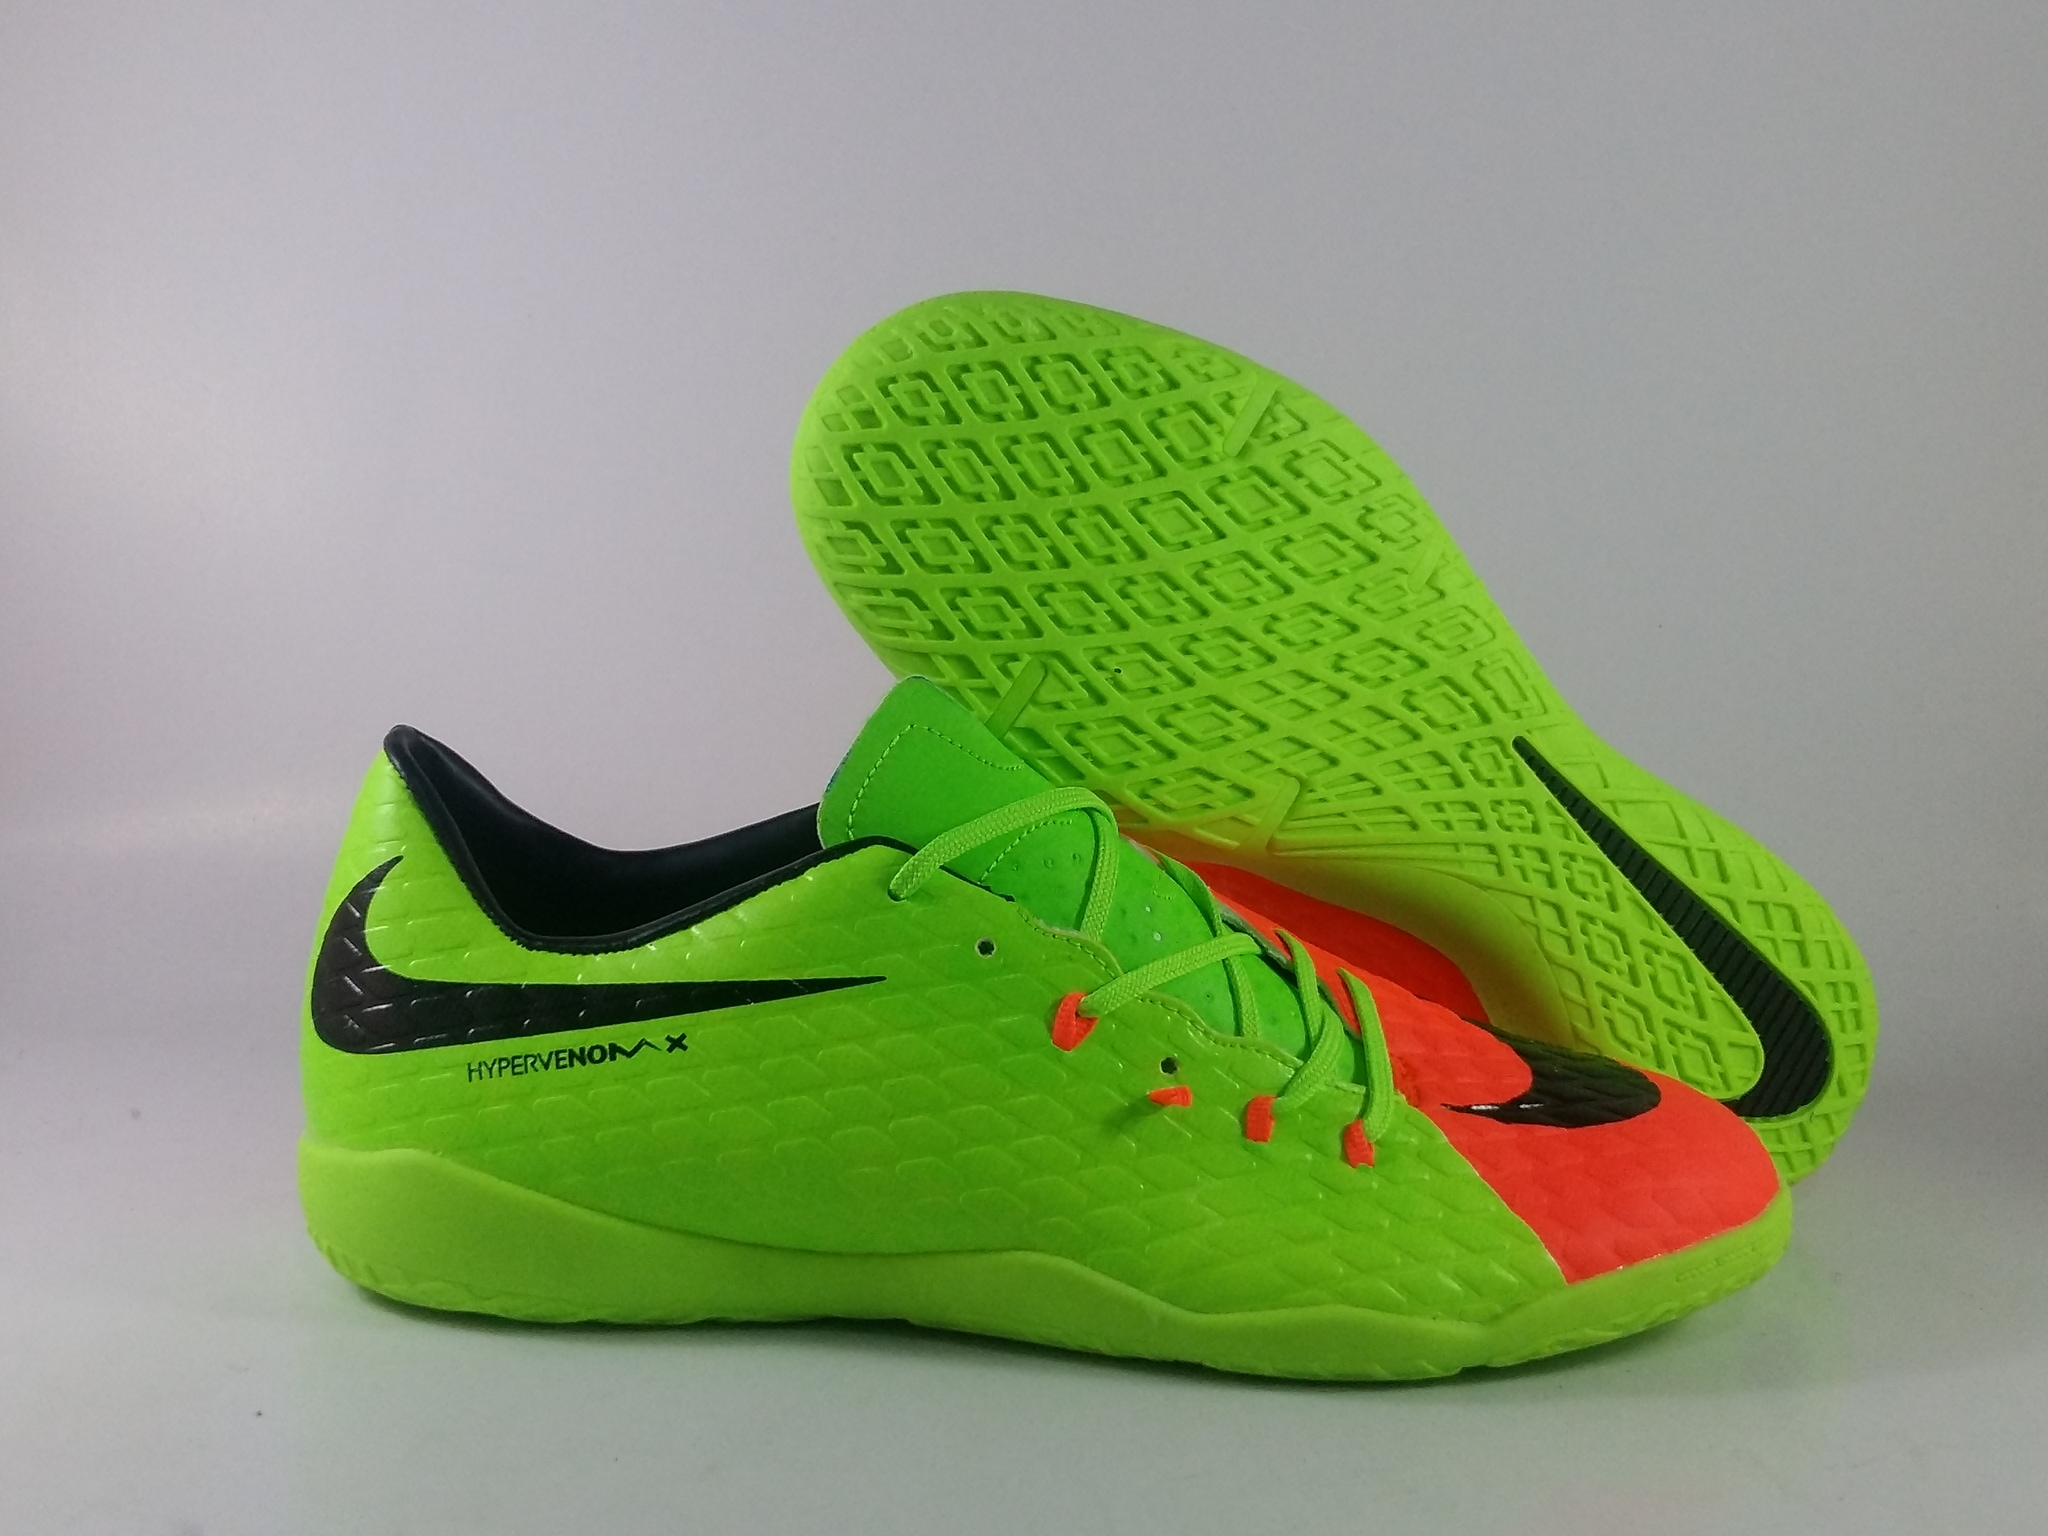 b41a1a7cd ... promo code for jual sepatu futsal nike hypervenom phelon iii green ic  replika impor thumbstore tokopedia